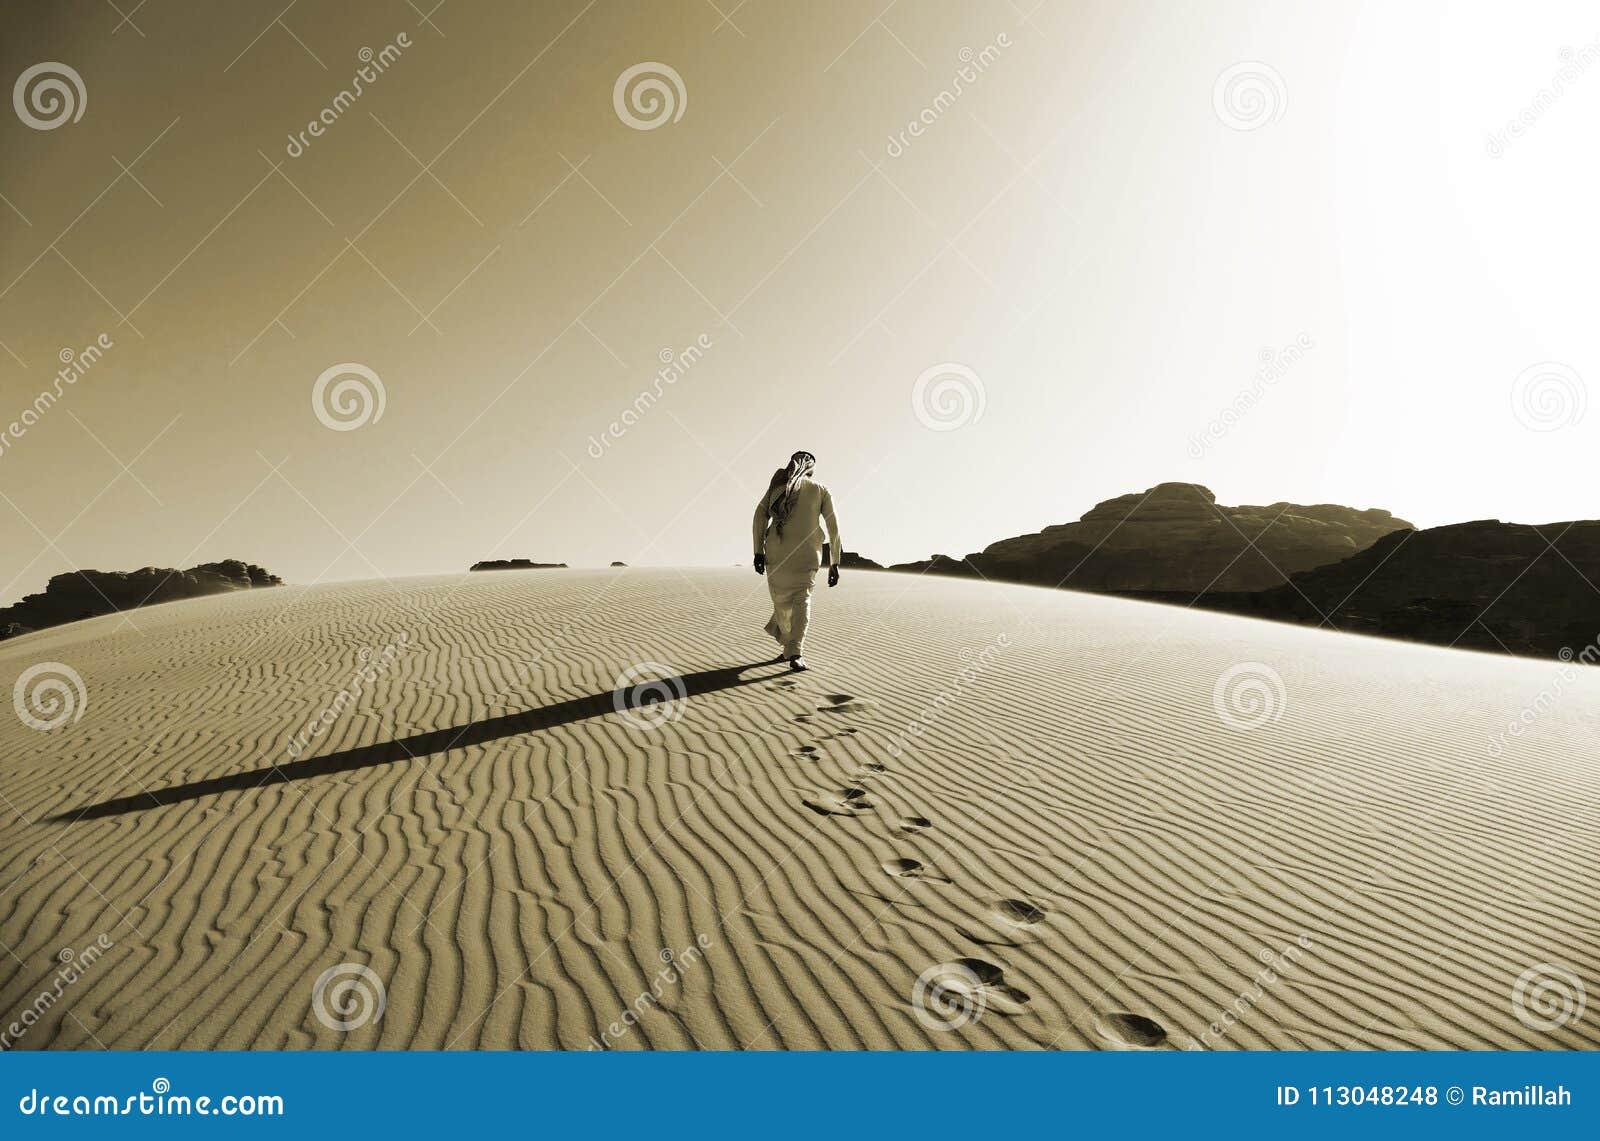 Bedouin Walking on the Sand Dunes in Wadi Rum Desert, Jordan in Sepia Colour